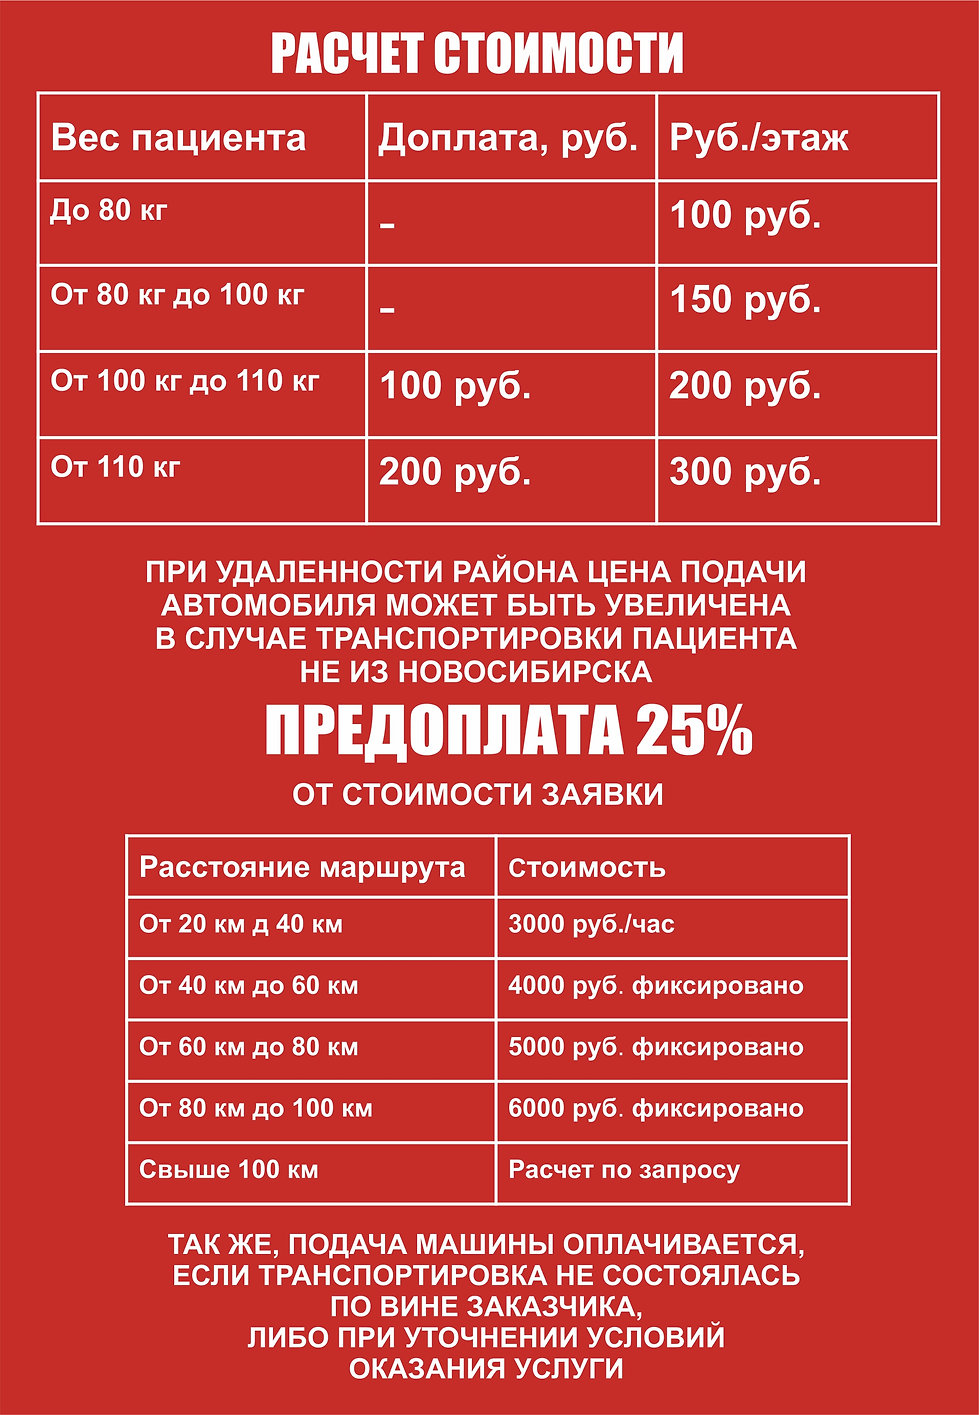 КАРТИНКА 5.jpg